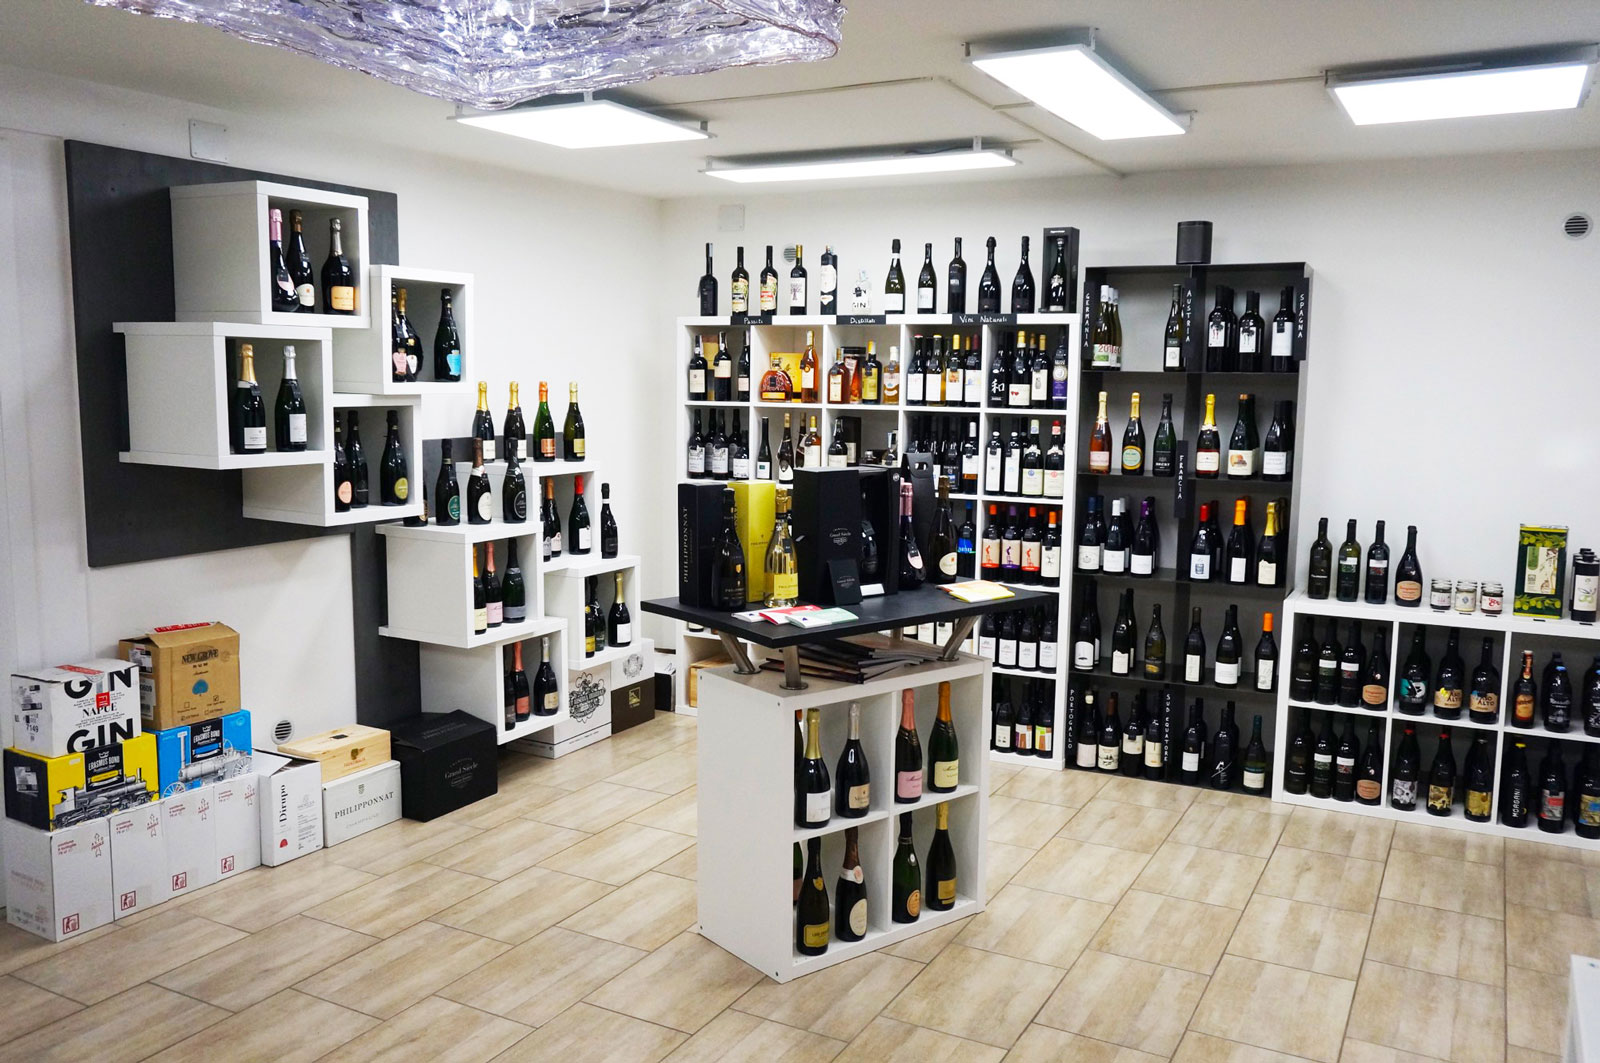 Enoteca di vini Botrytis a Ferrara